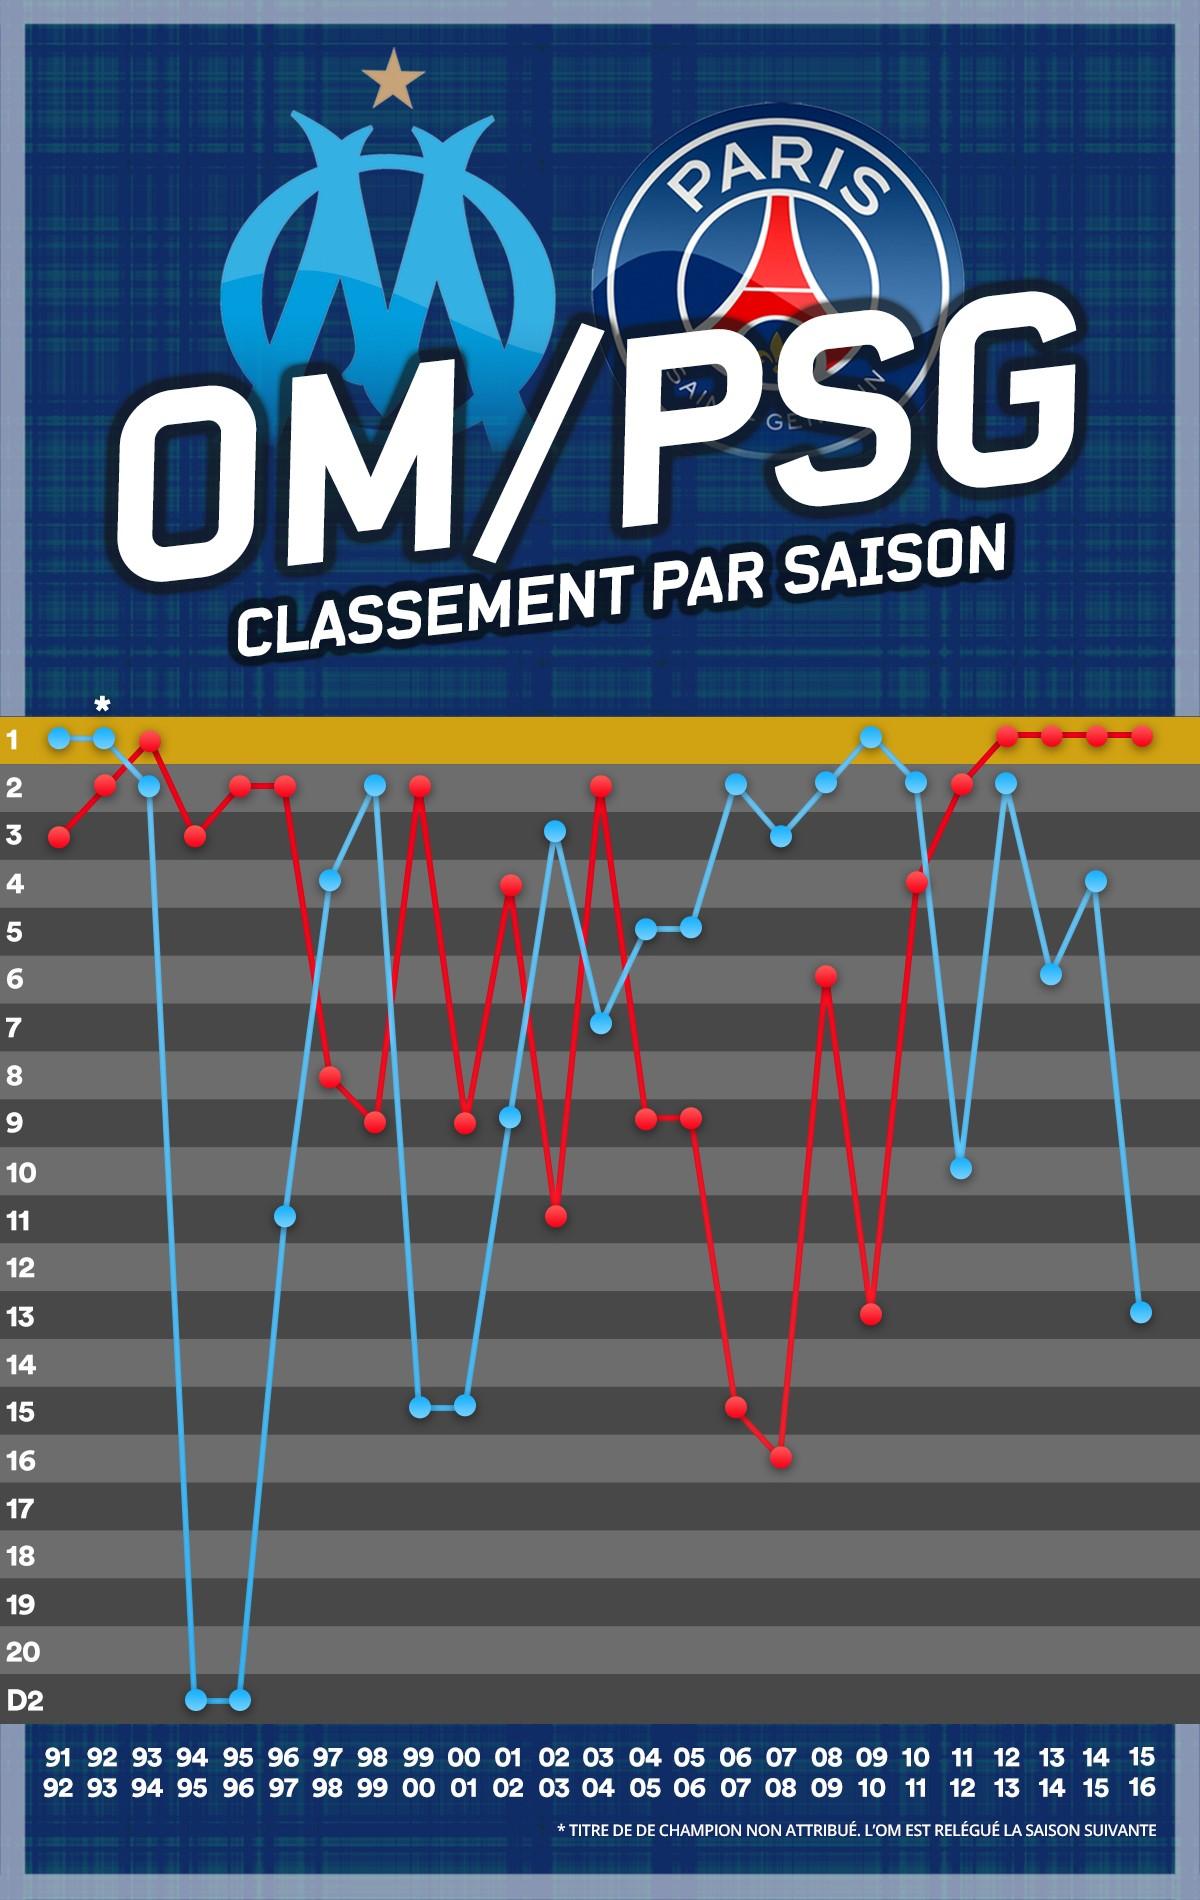 OM - PSG classements